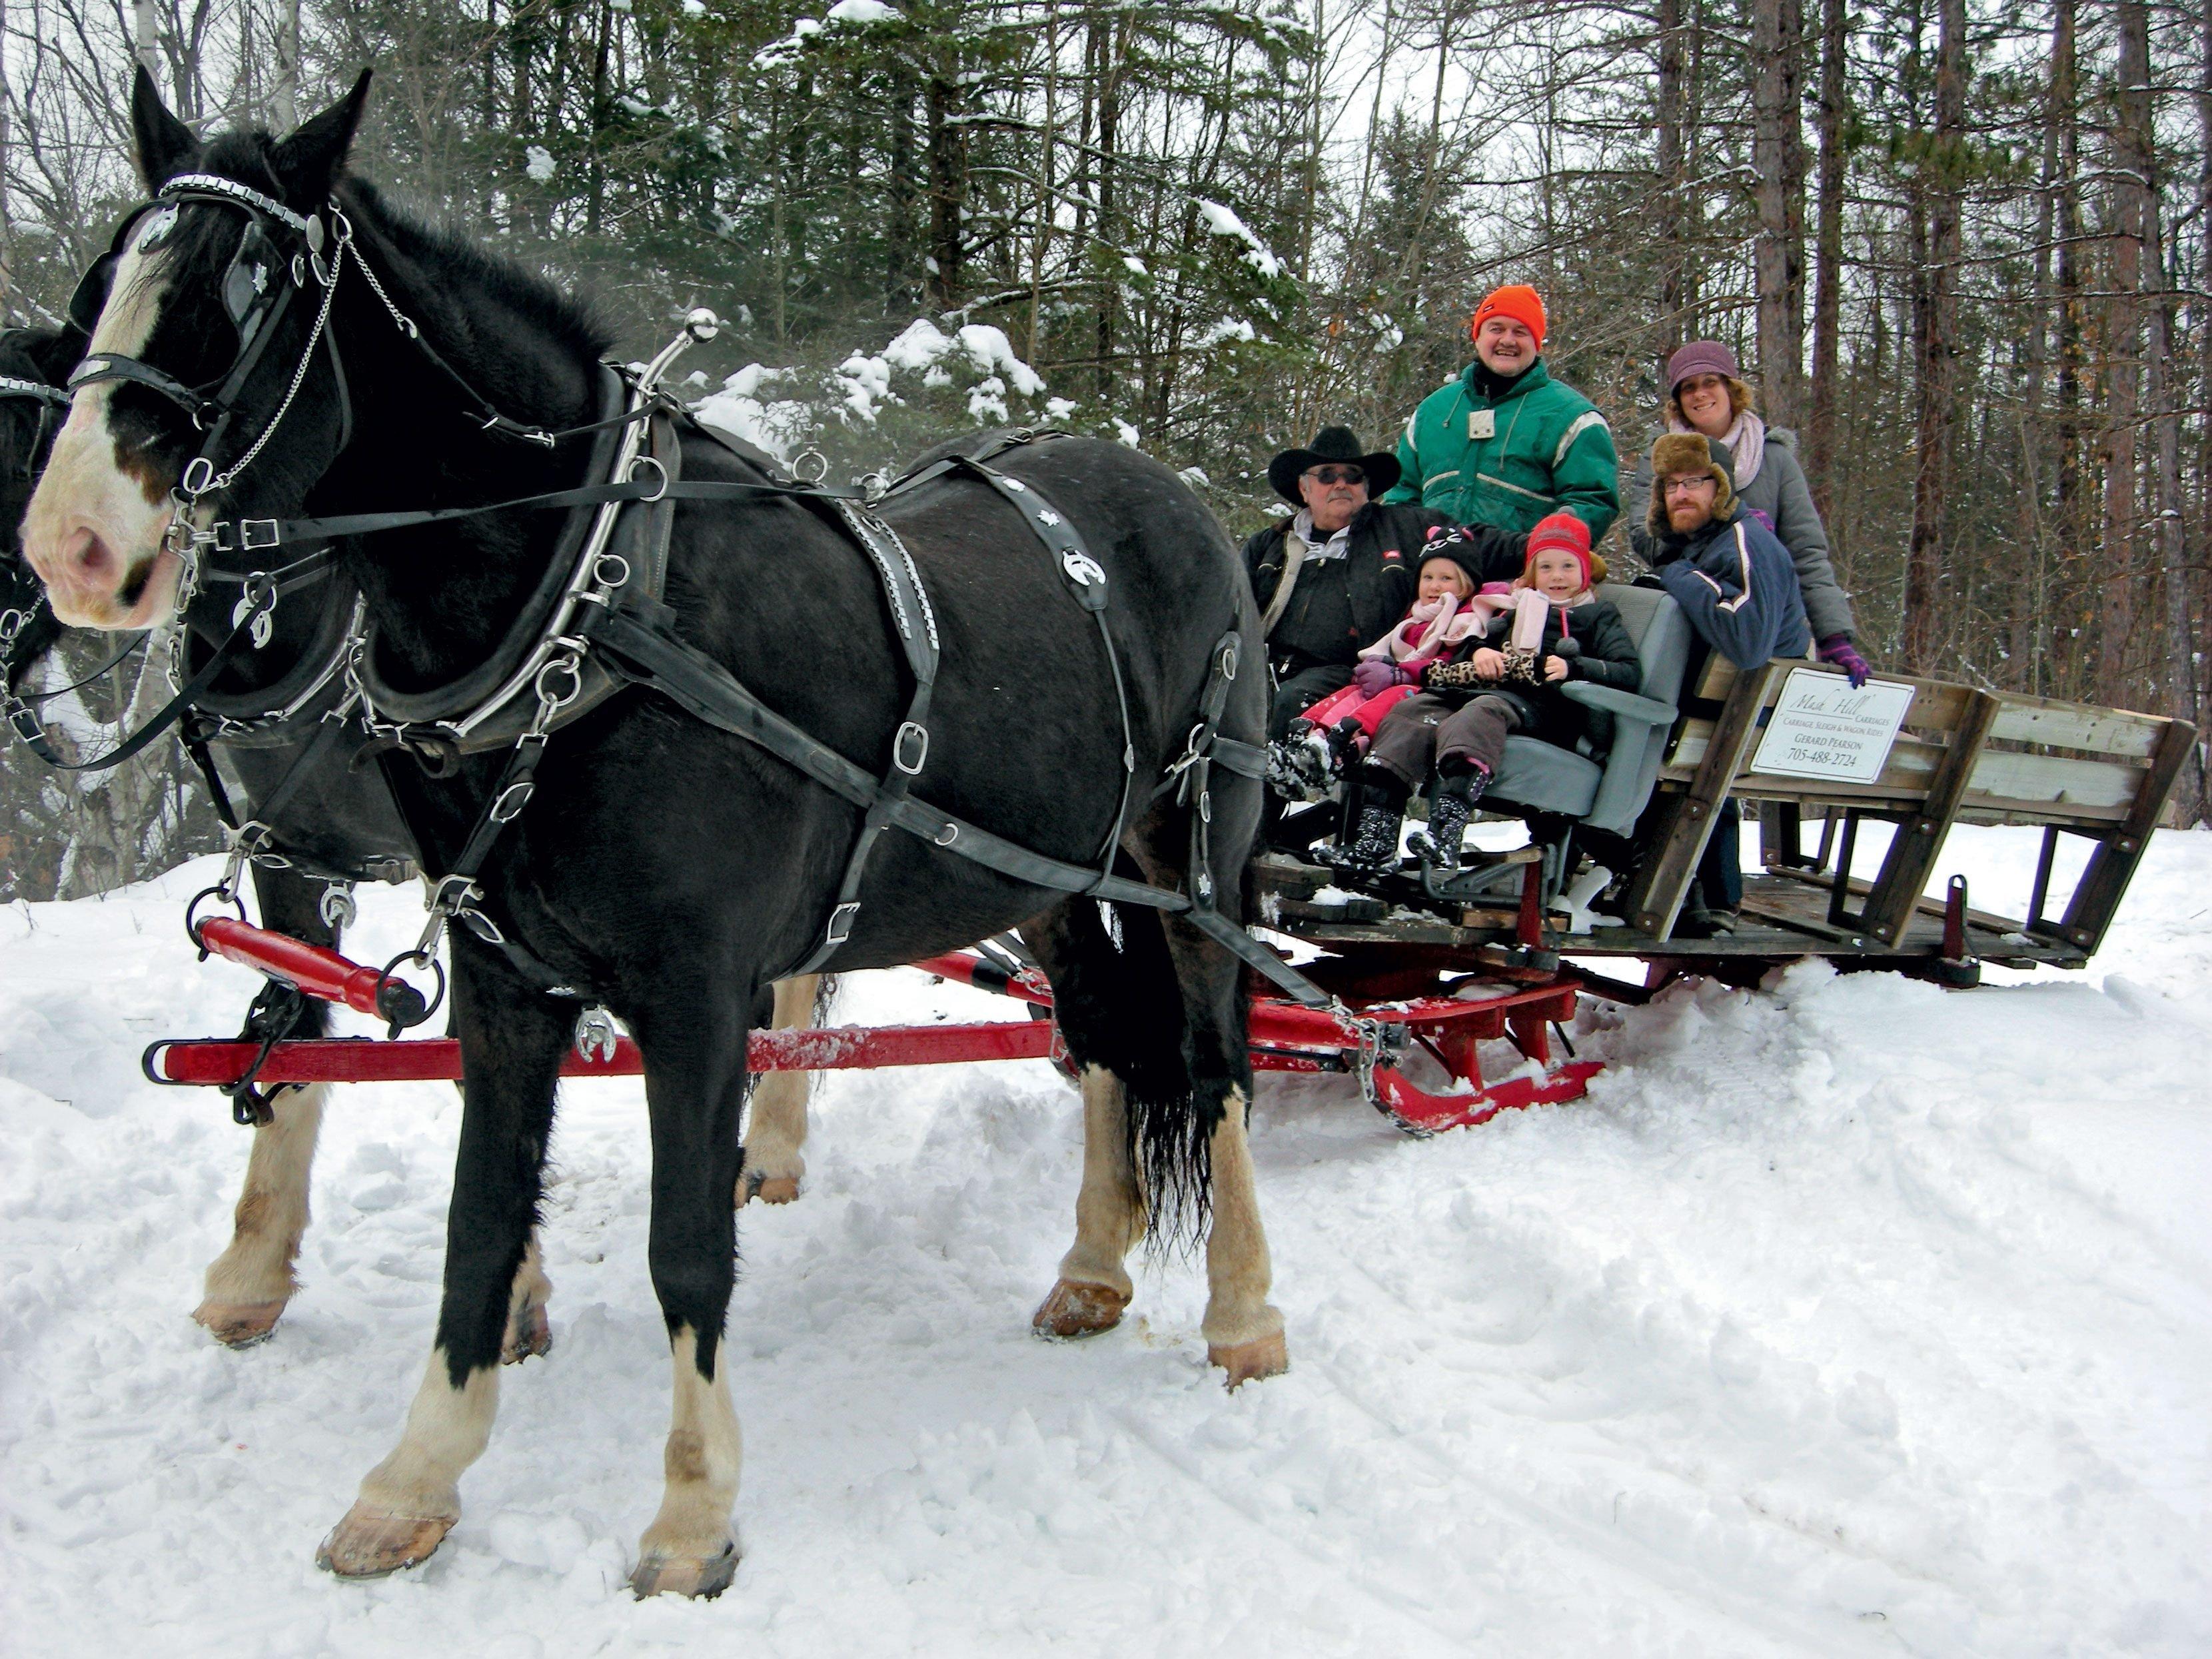 Winter in Canada: Dashing Through the Snow